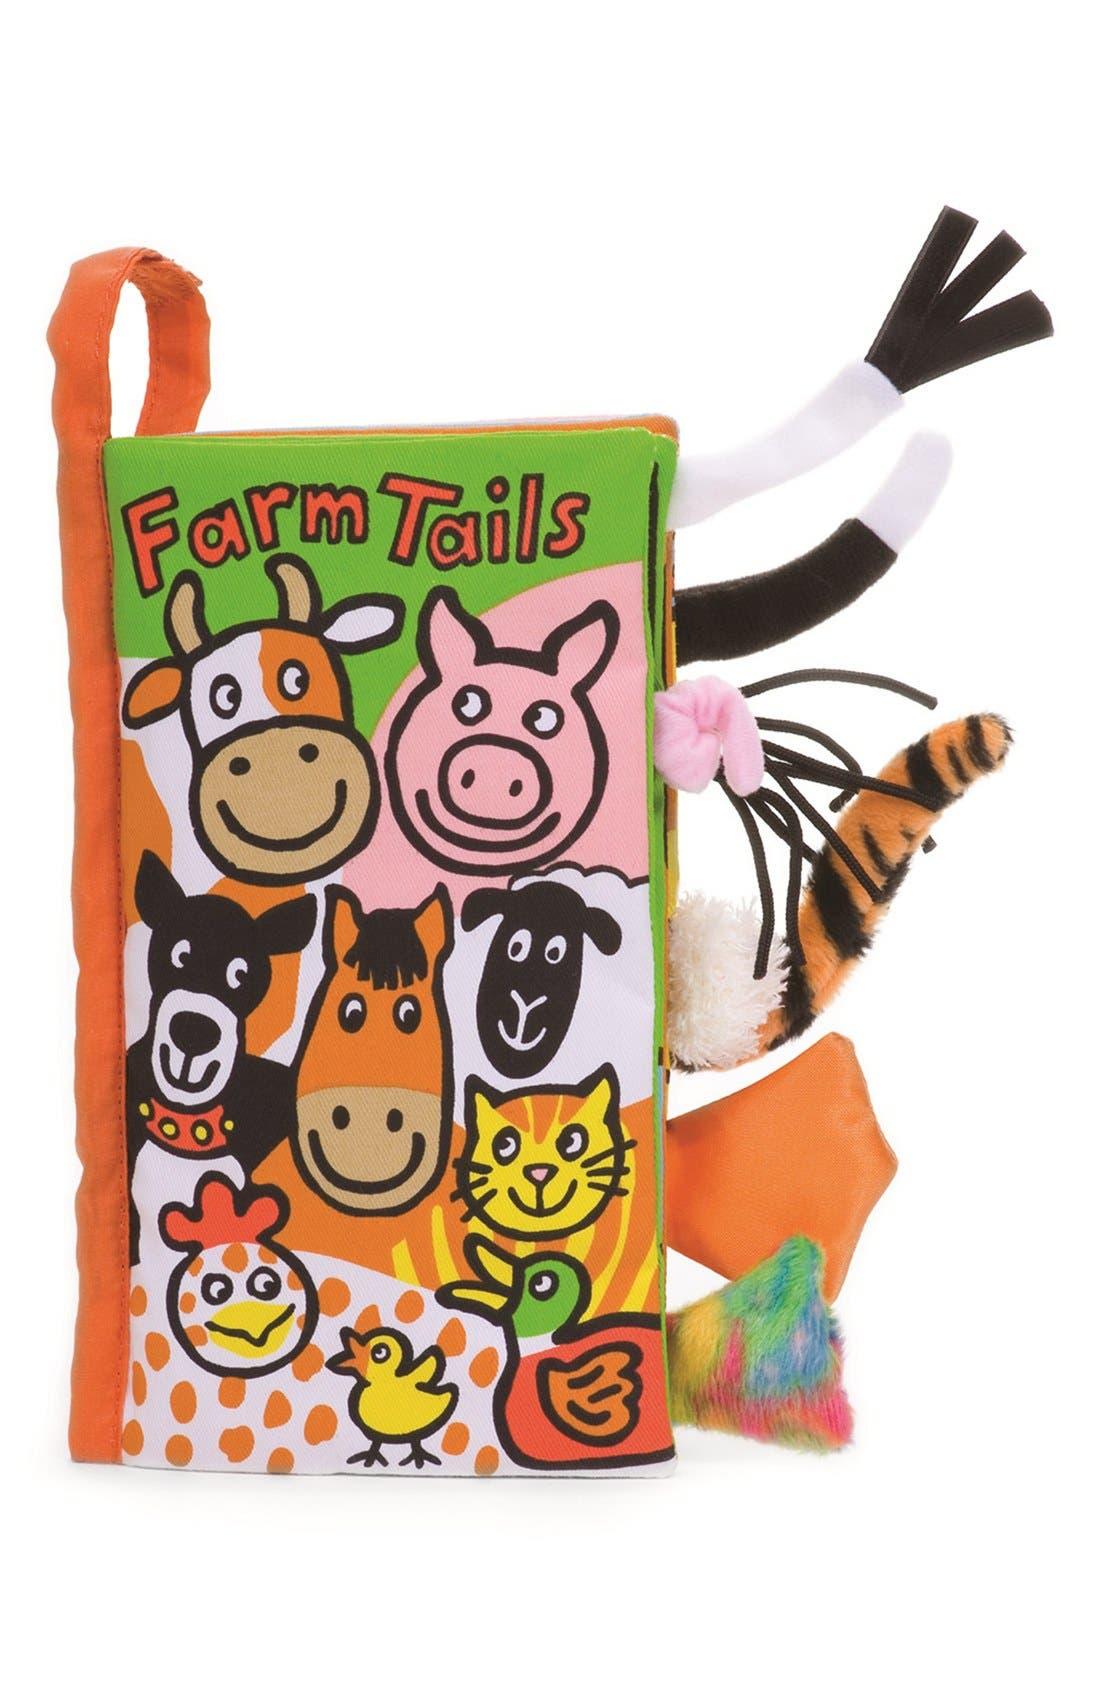 JELLYCAT 'Farm Tails' Book